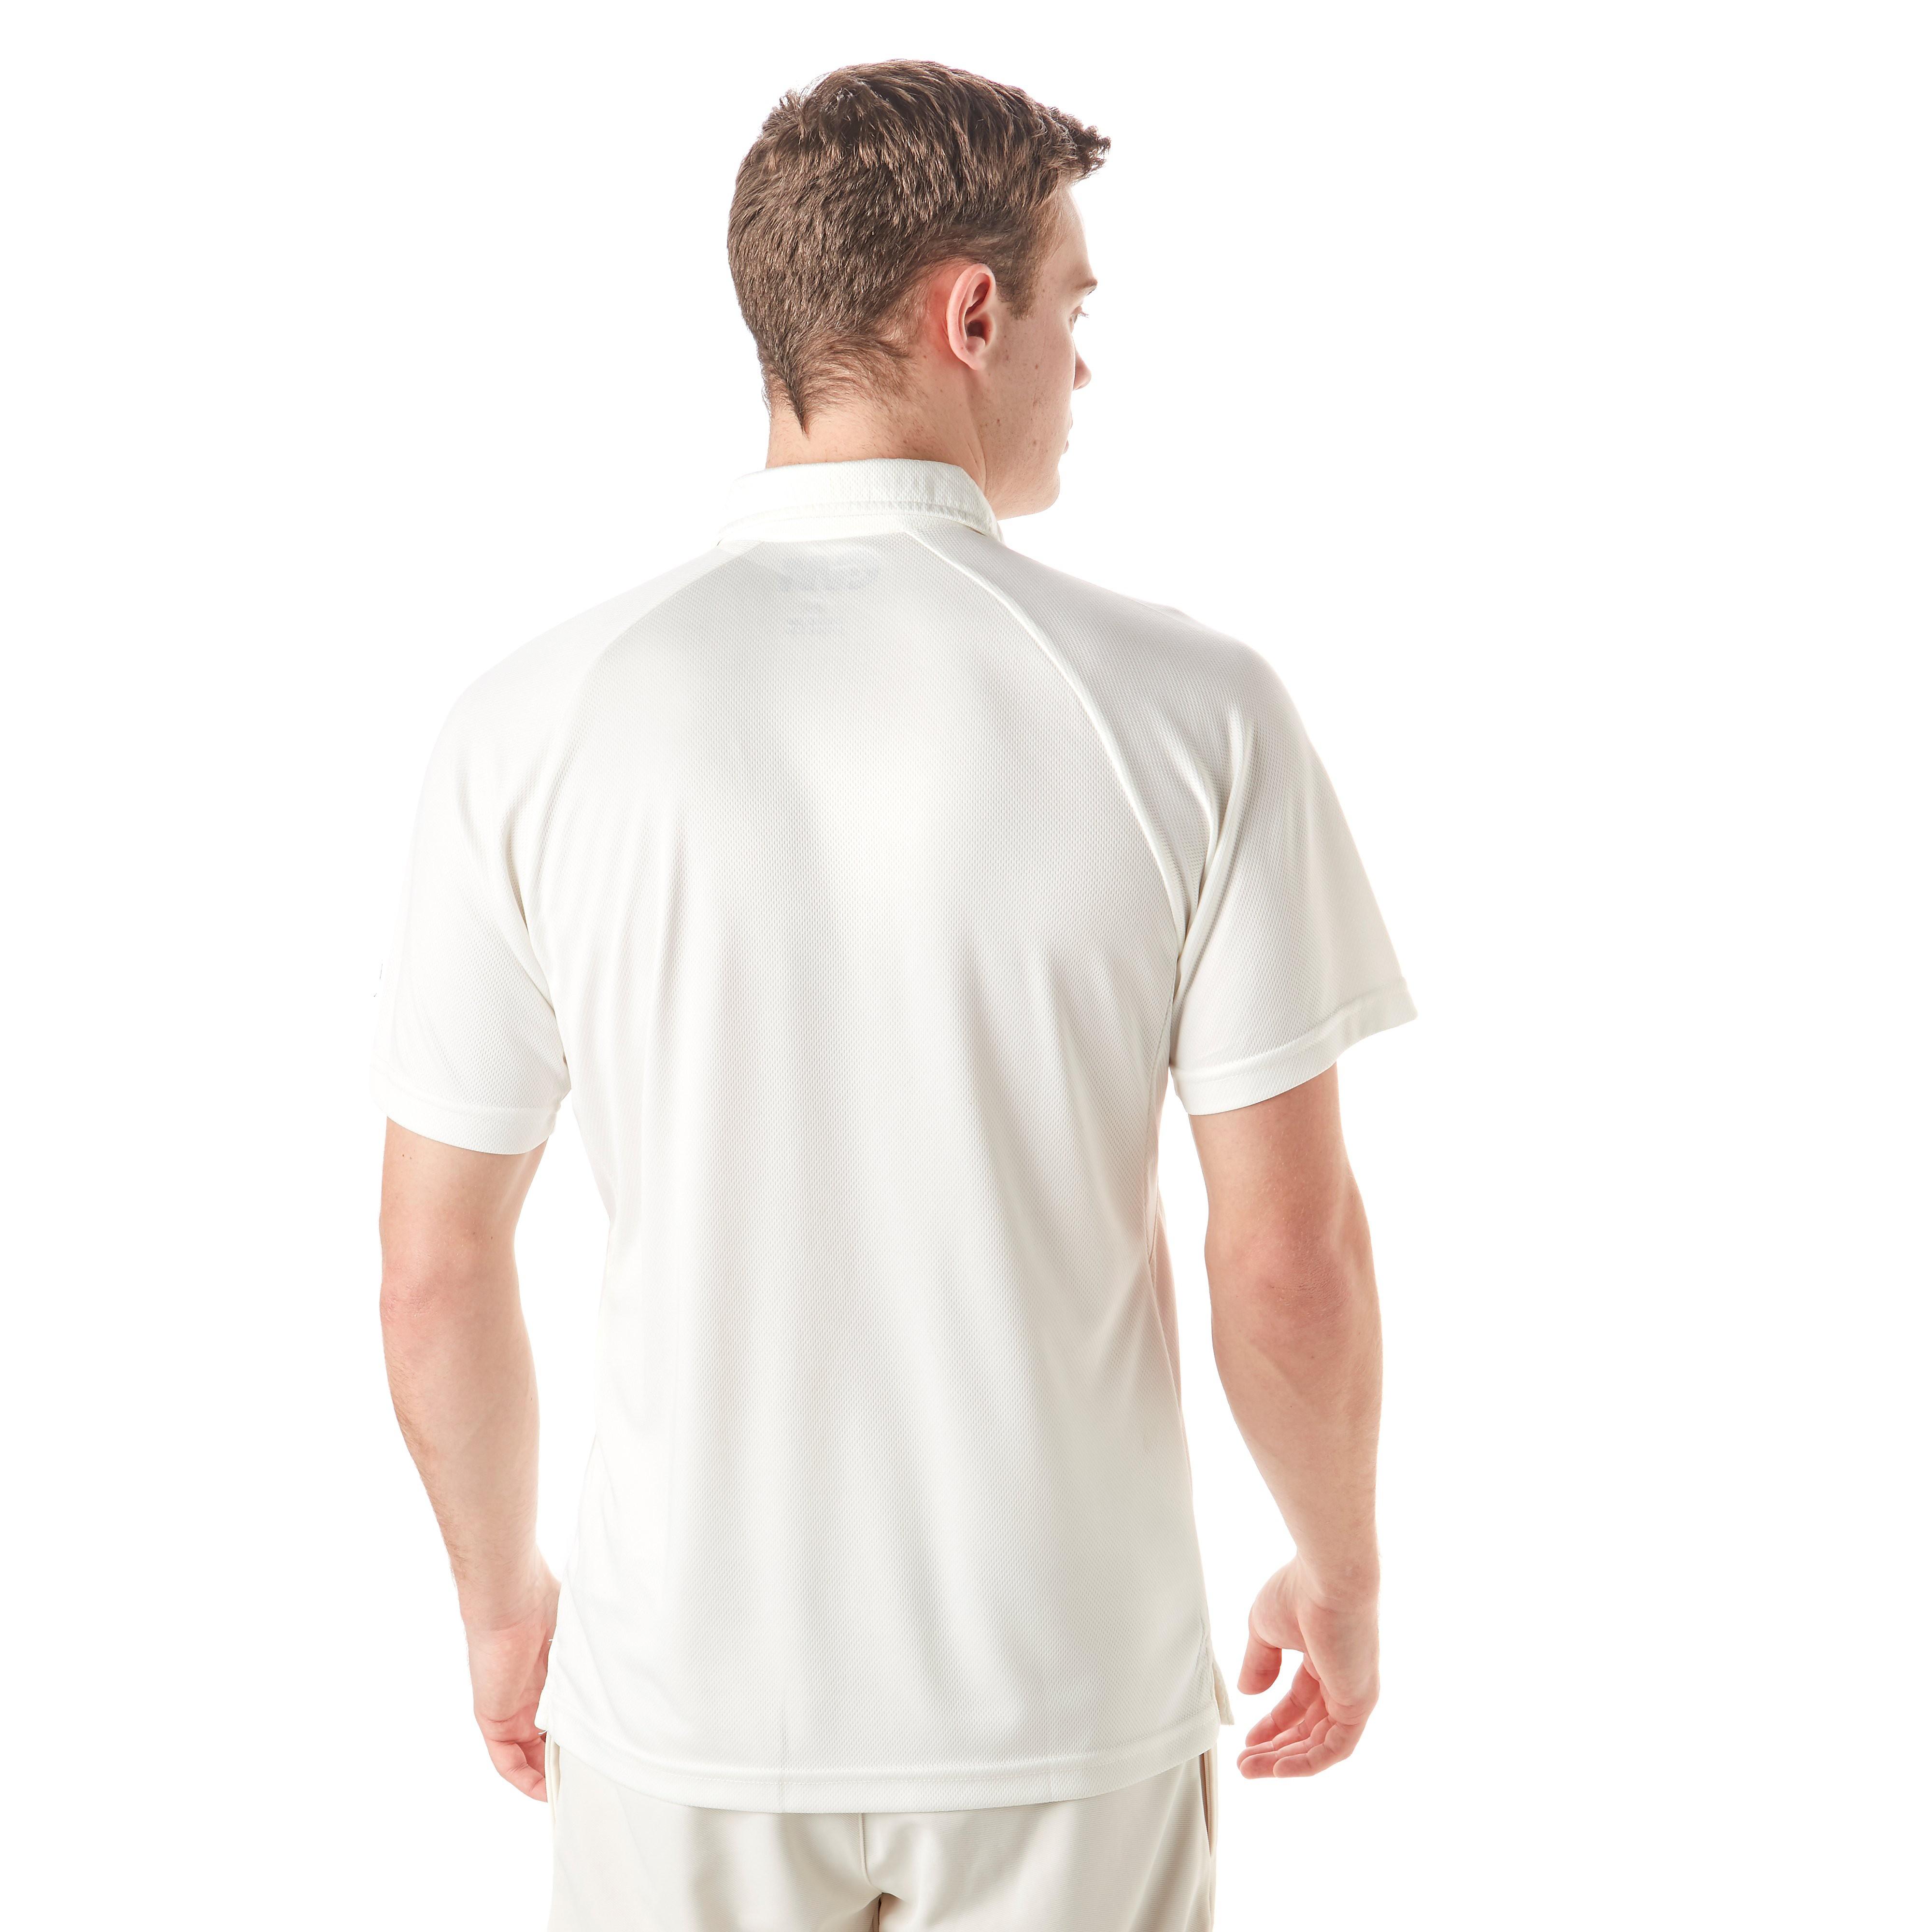 Gunn & Moore Premier Club Short Sleeve Men's Cricket Shirt